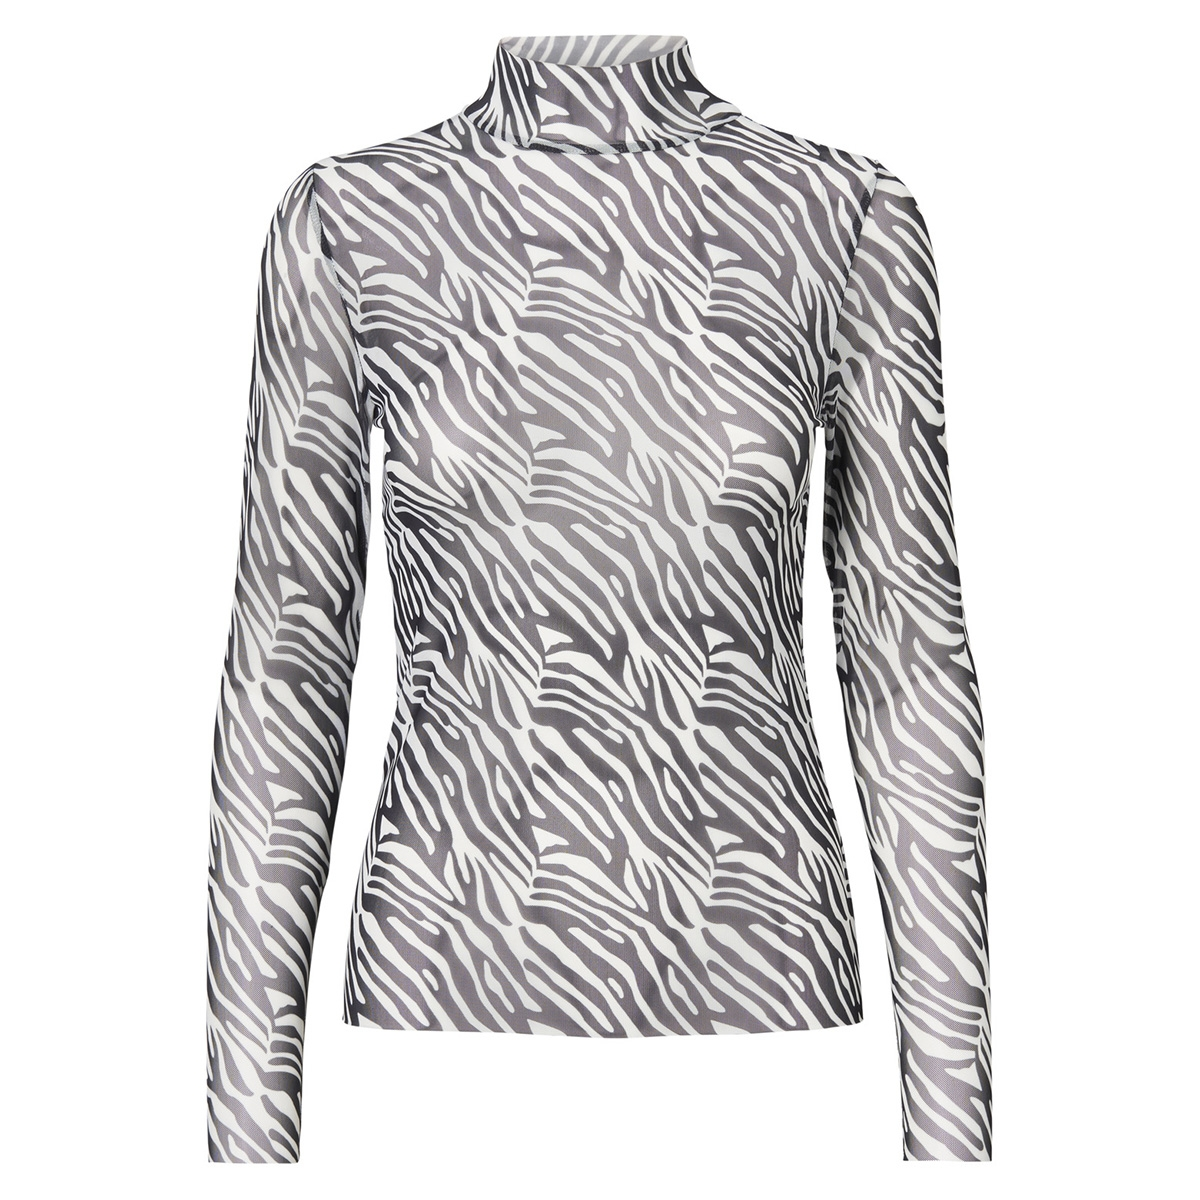 nmkarla l/s top 8 27005085 noisy may t-shirt black/zebra